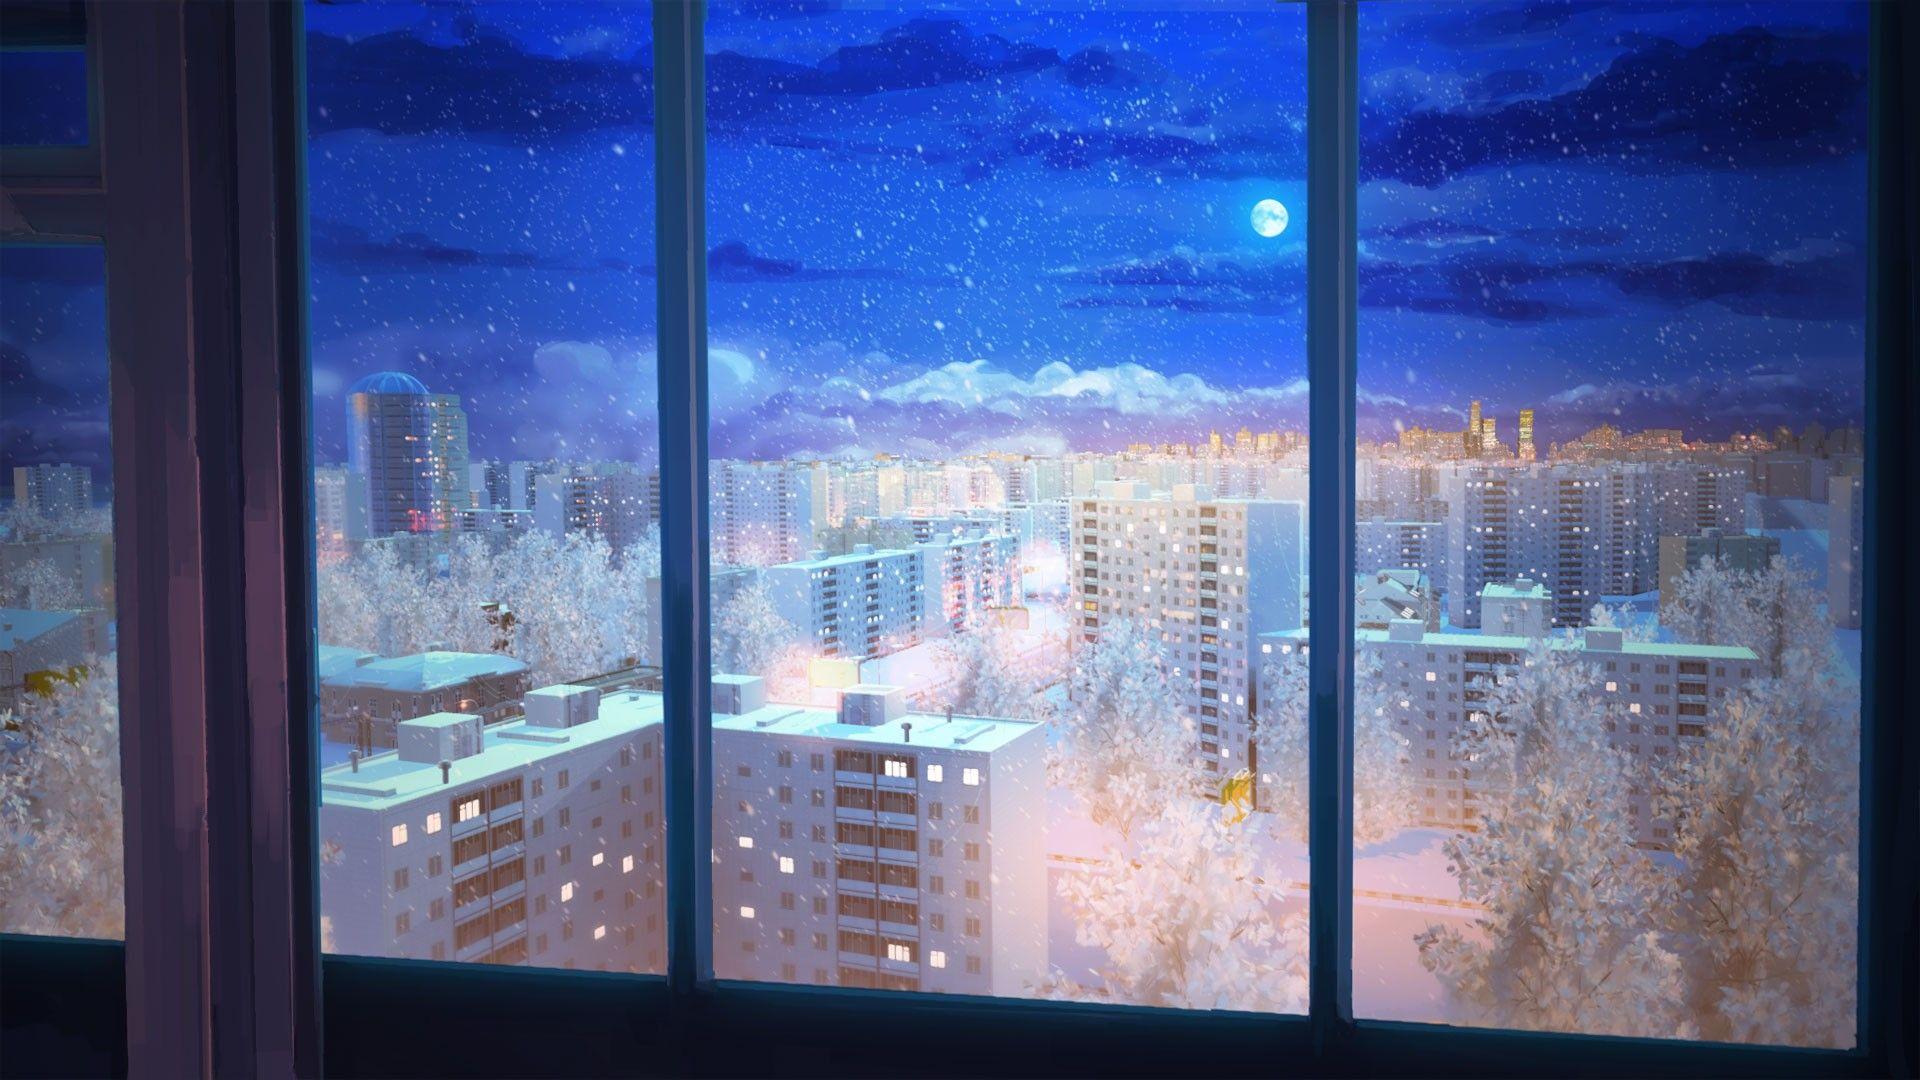 Night Snow Everlasting Summer Wallpaper Anime Scenery Anime Scenery Wallpaper Episode Backgrounds